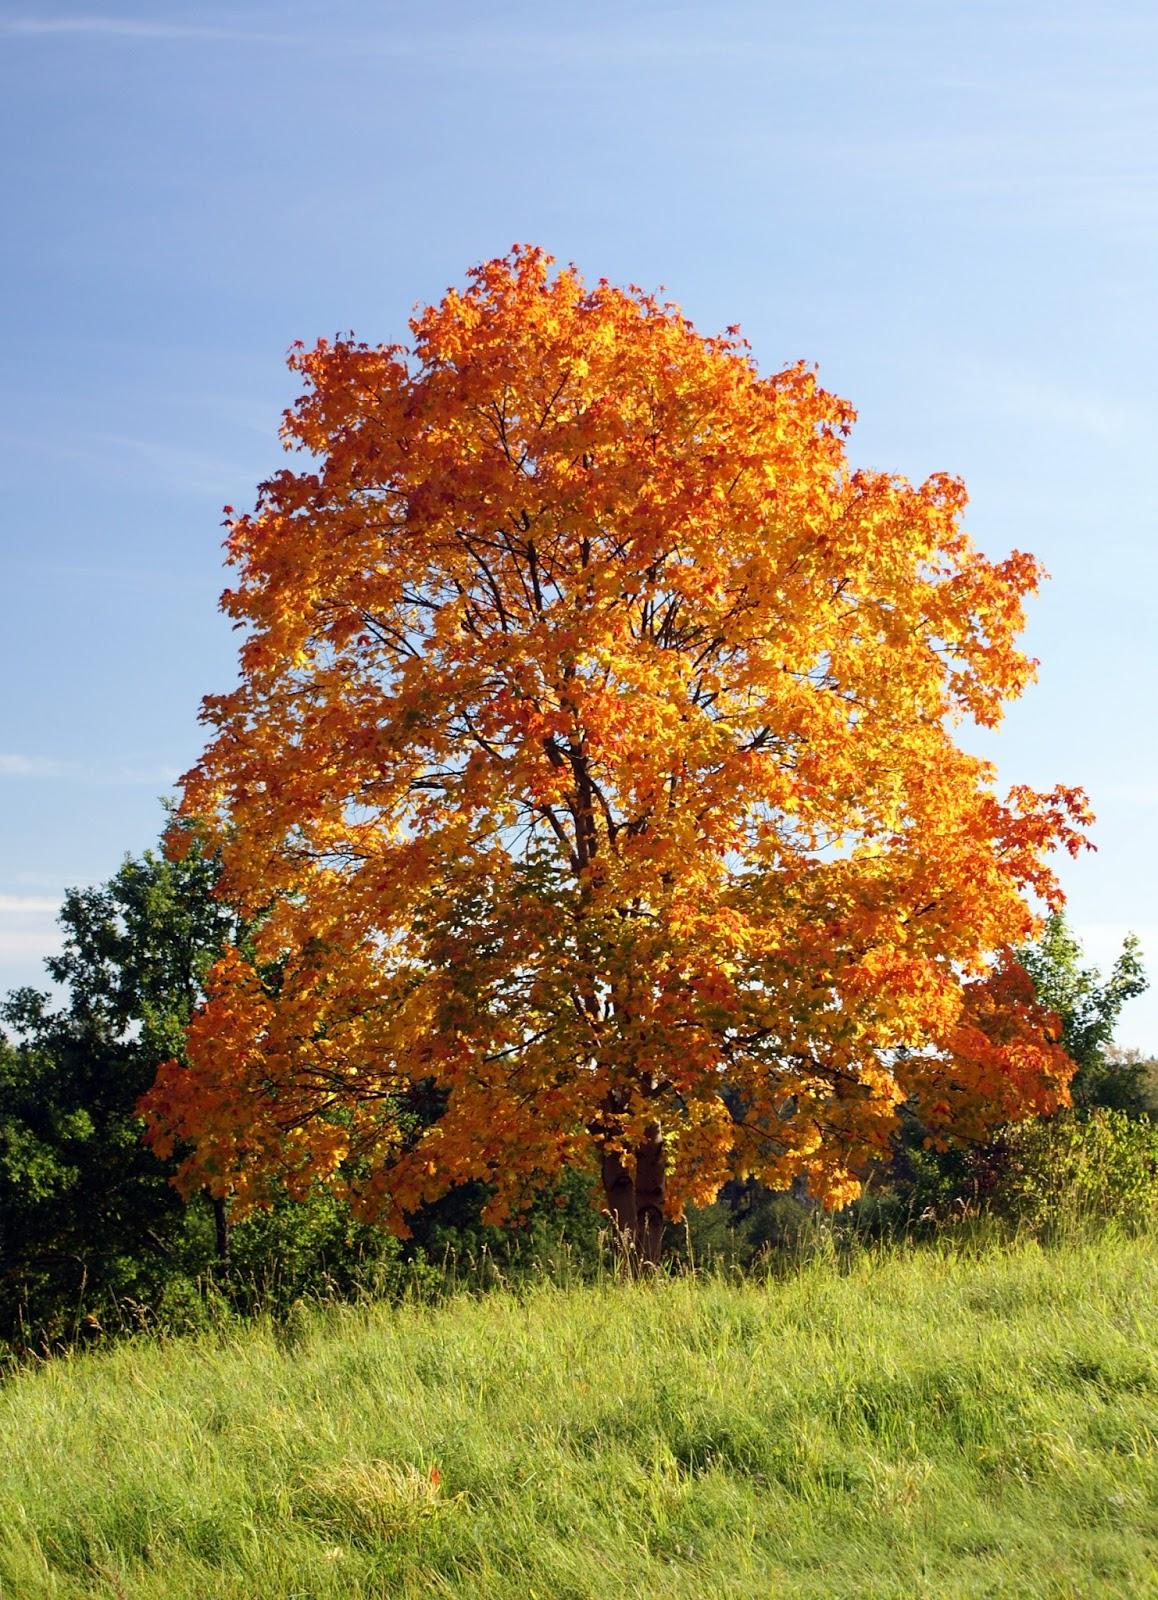 Trees planet acer platanoides norway maple - Arce platanoide ...